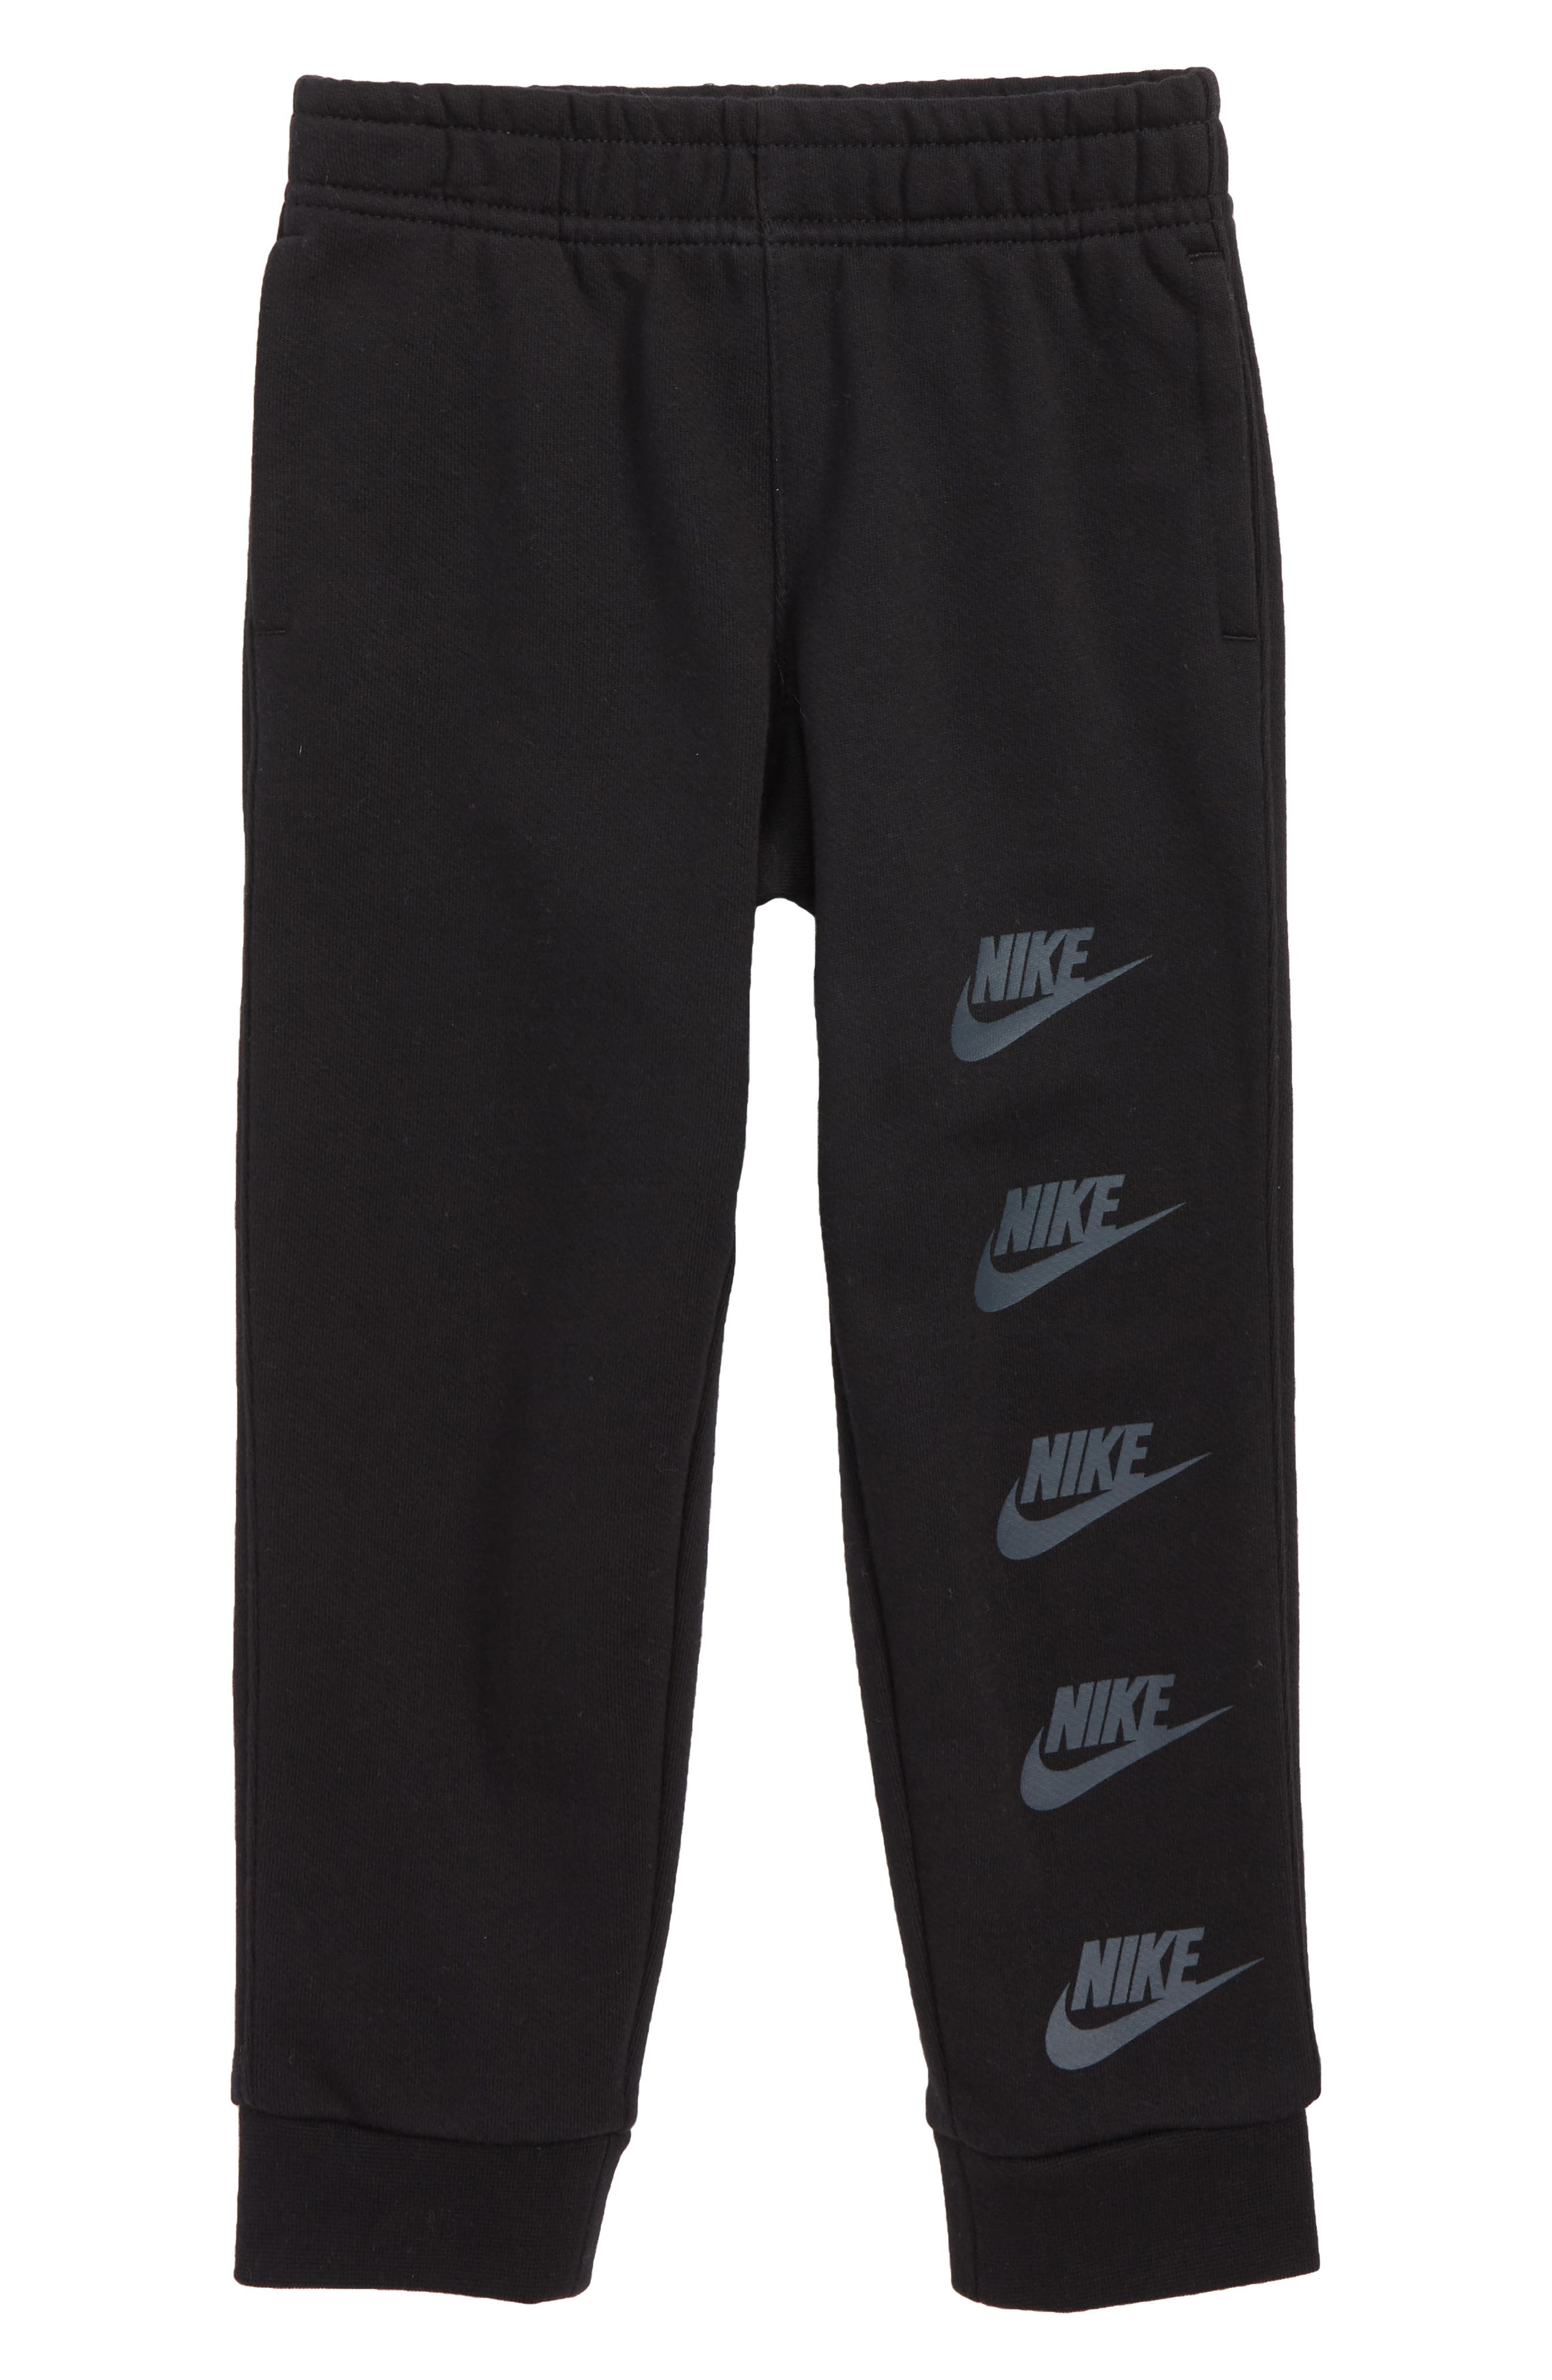 Toddler Boys Nike Sportswear Club Archive Sweatpants